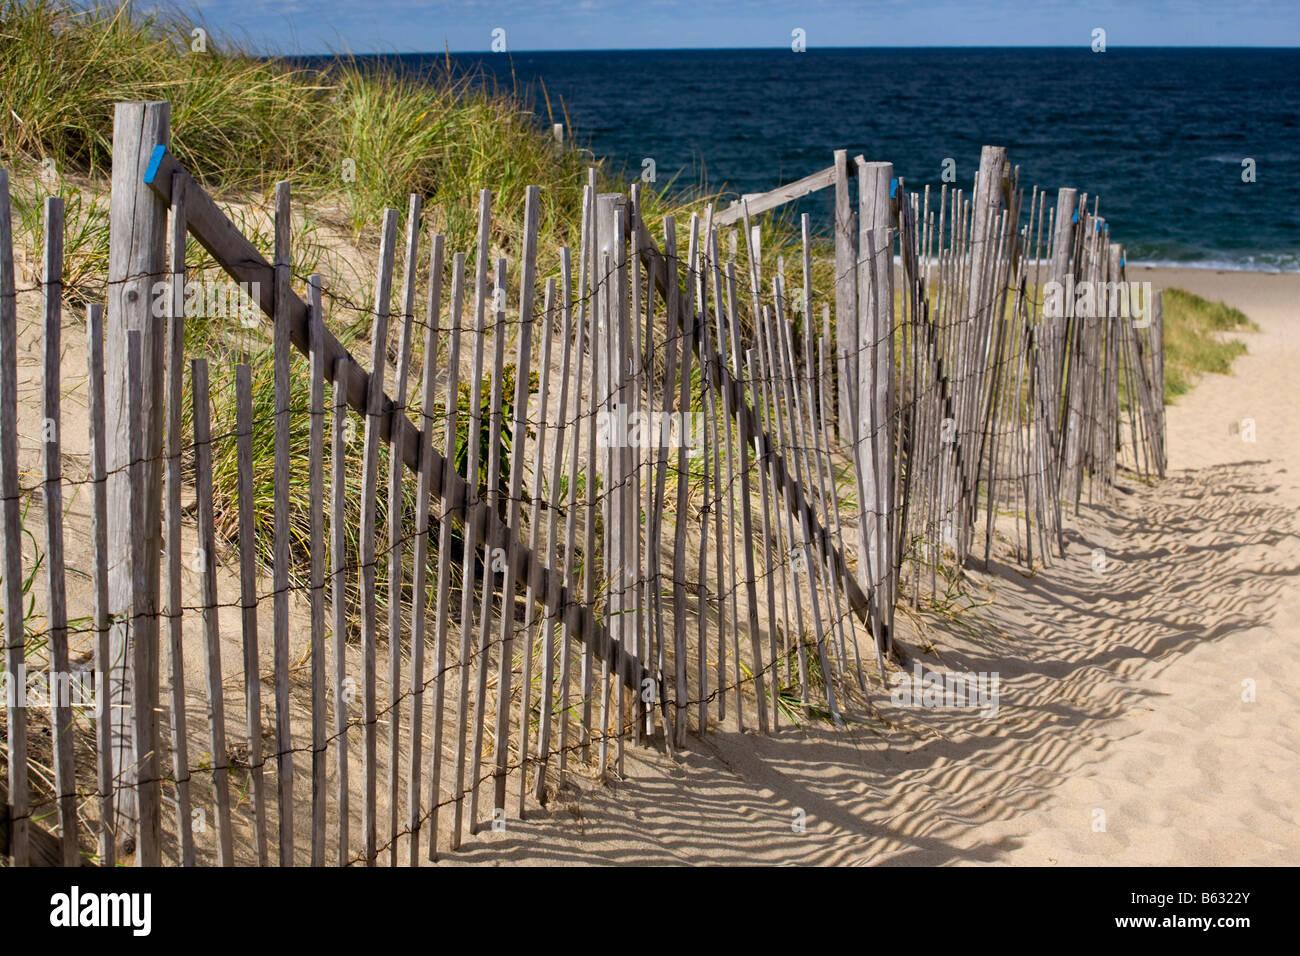 Cape Cod National Seashore Massachusetts USA - Stock Image